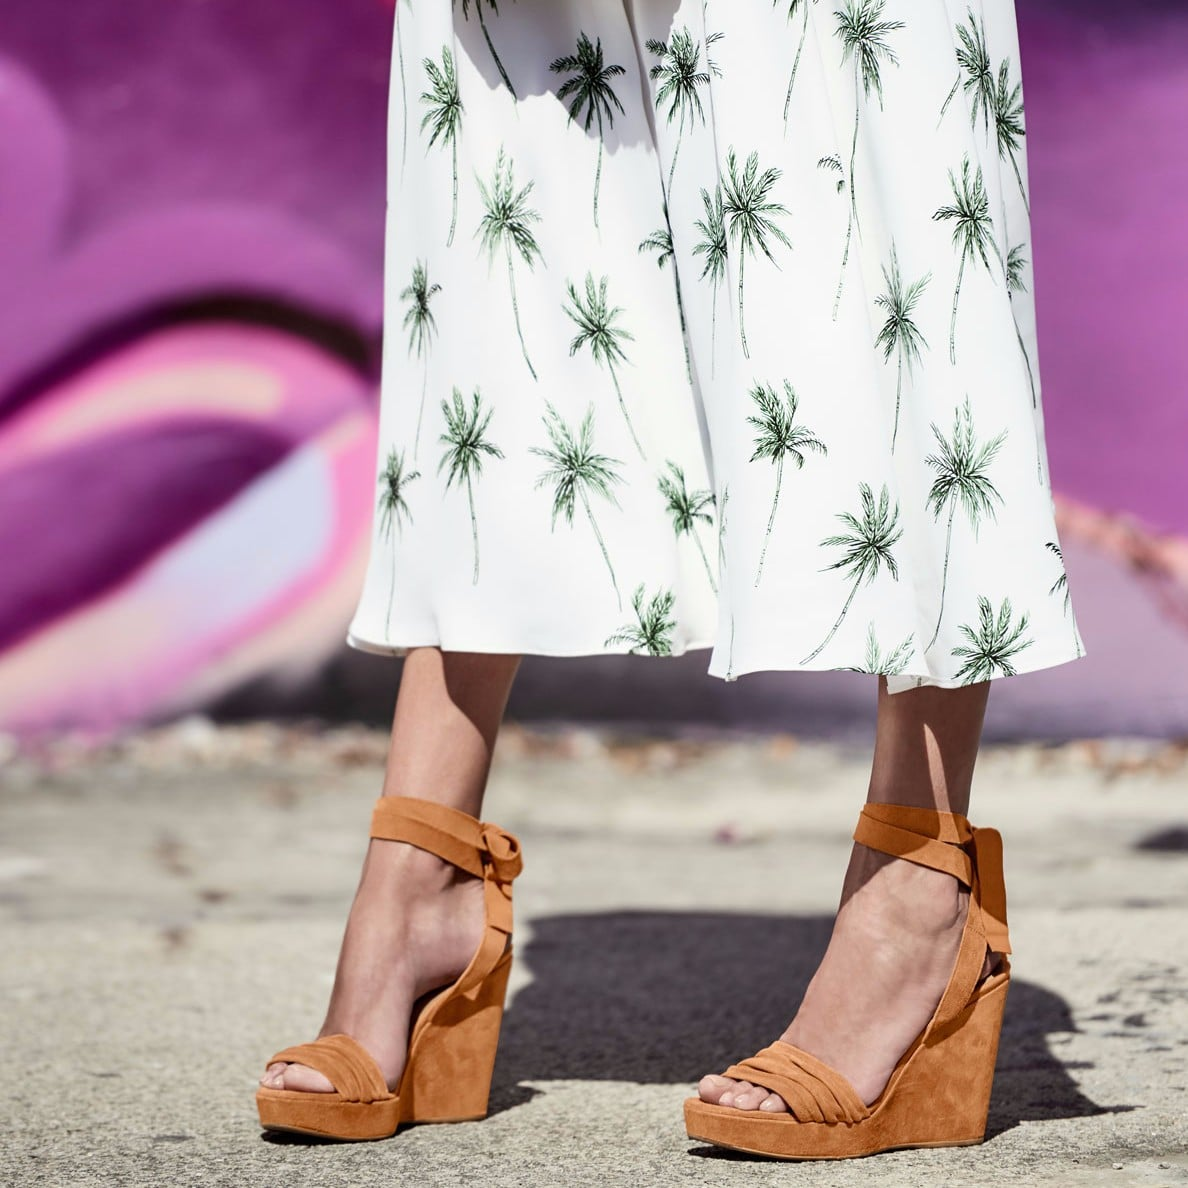 9da270bcd2a Topshop Wendy Bow Wedge Sandals ( 35